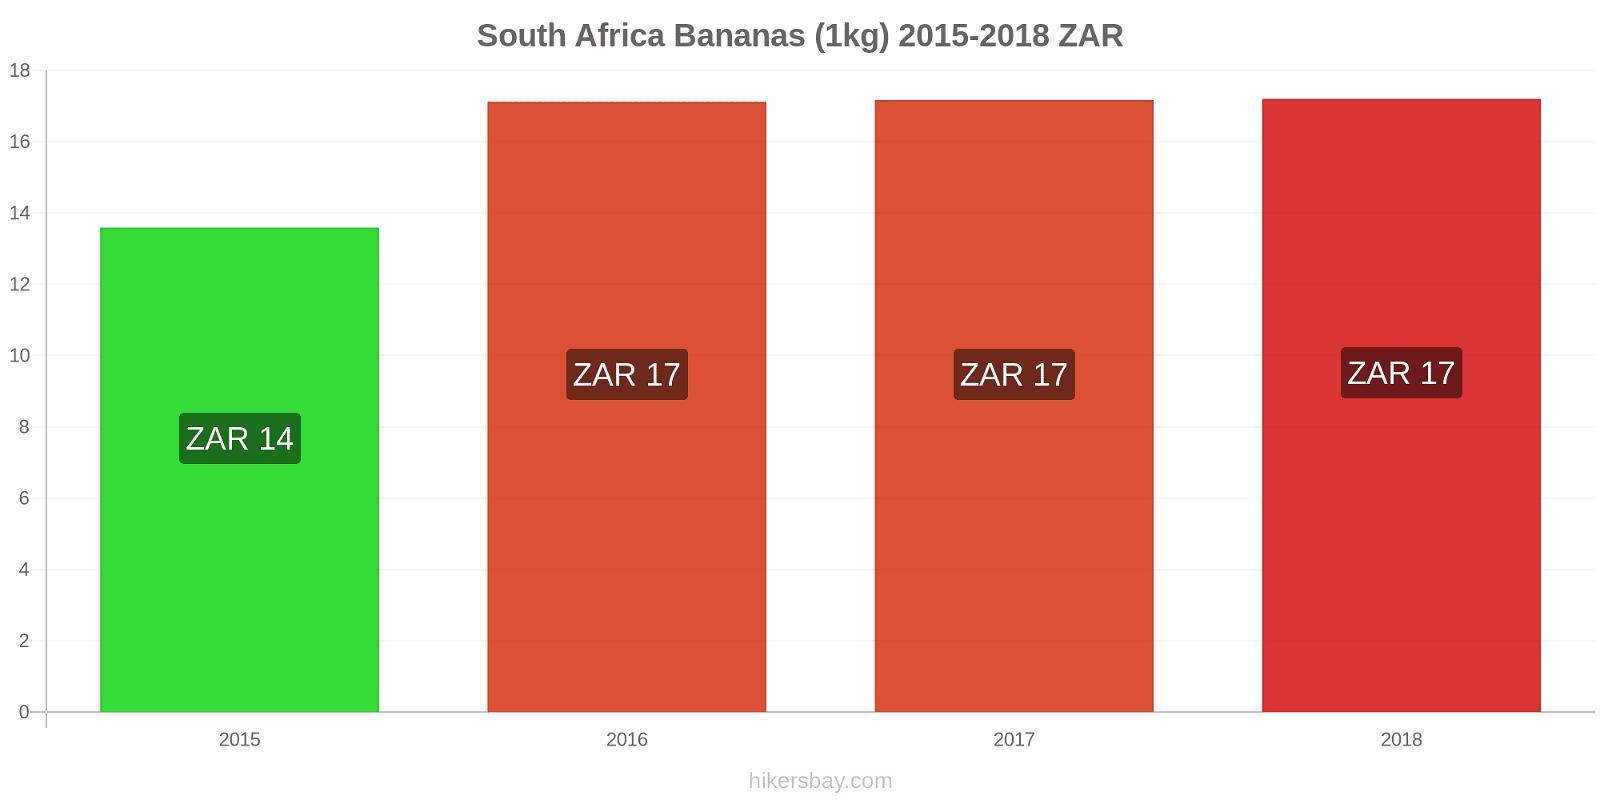 South Africa price changes Bananas (1kg) hikersbay.com